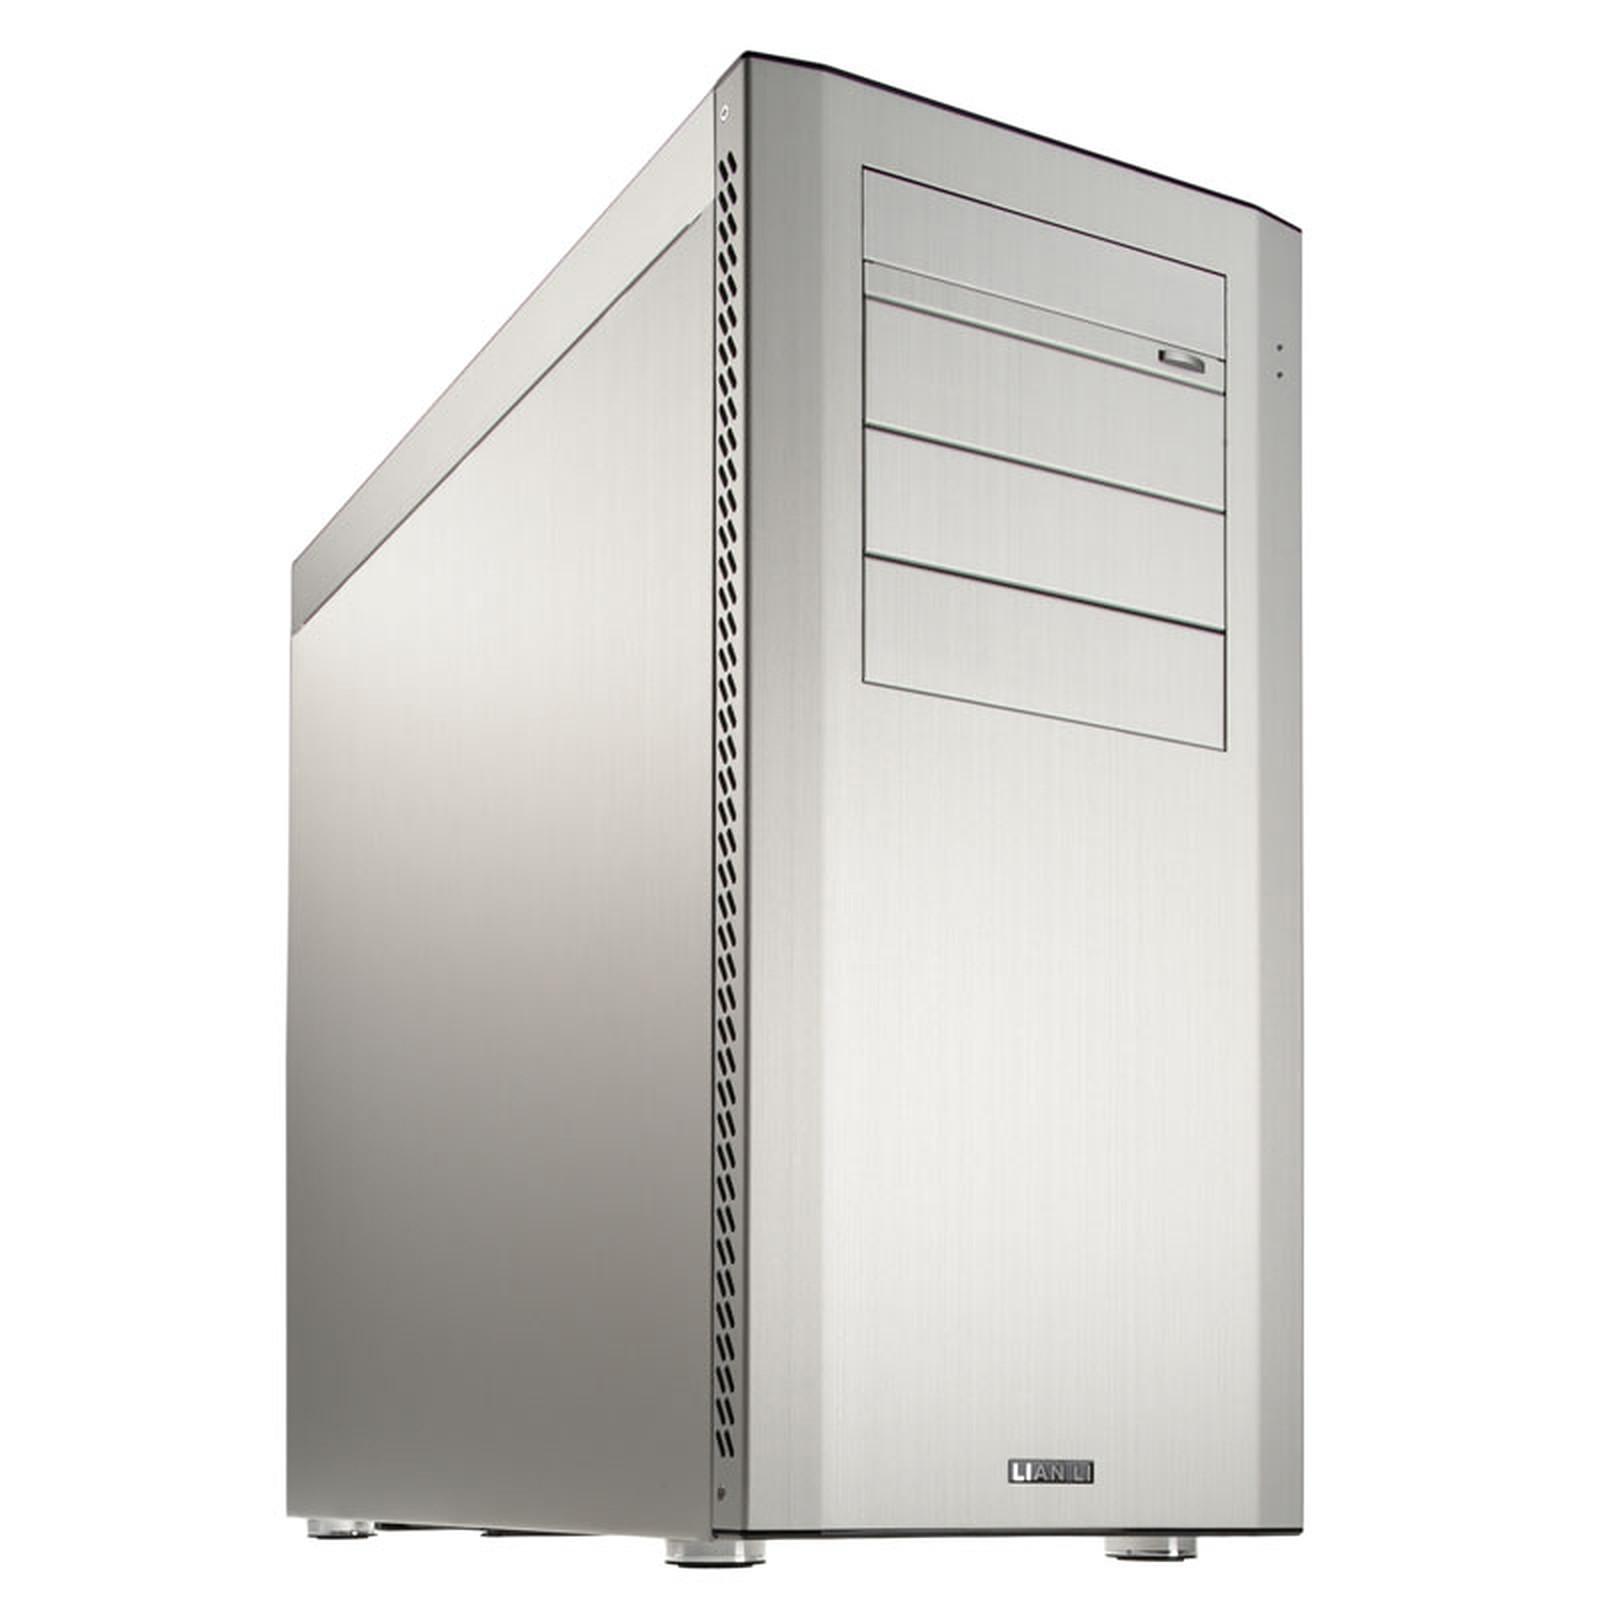 Lian Li PC-A61 (argent)